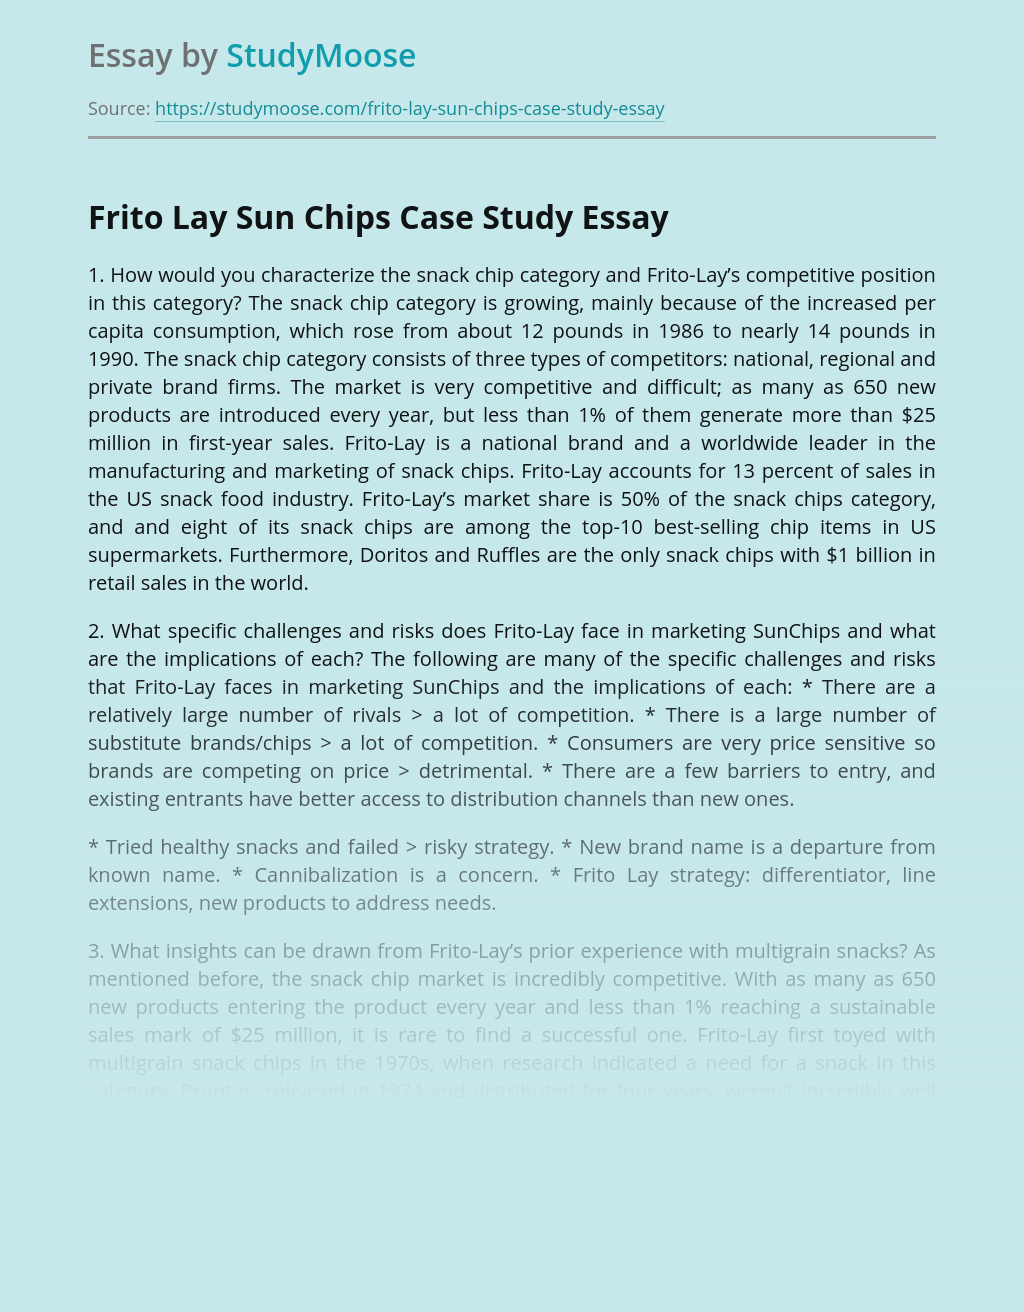 Frito Lay Sun Chips Case Study